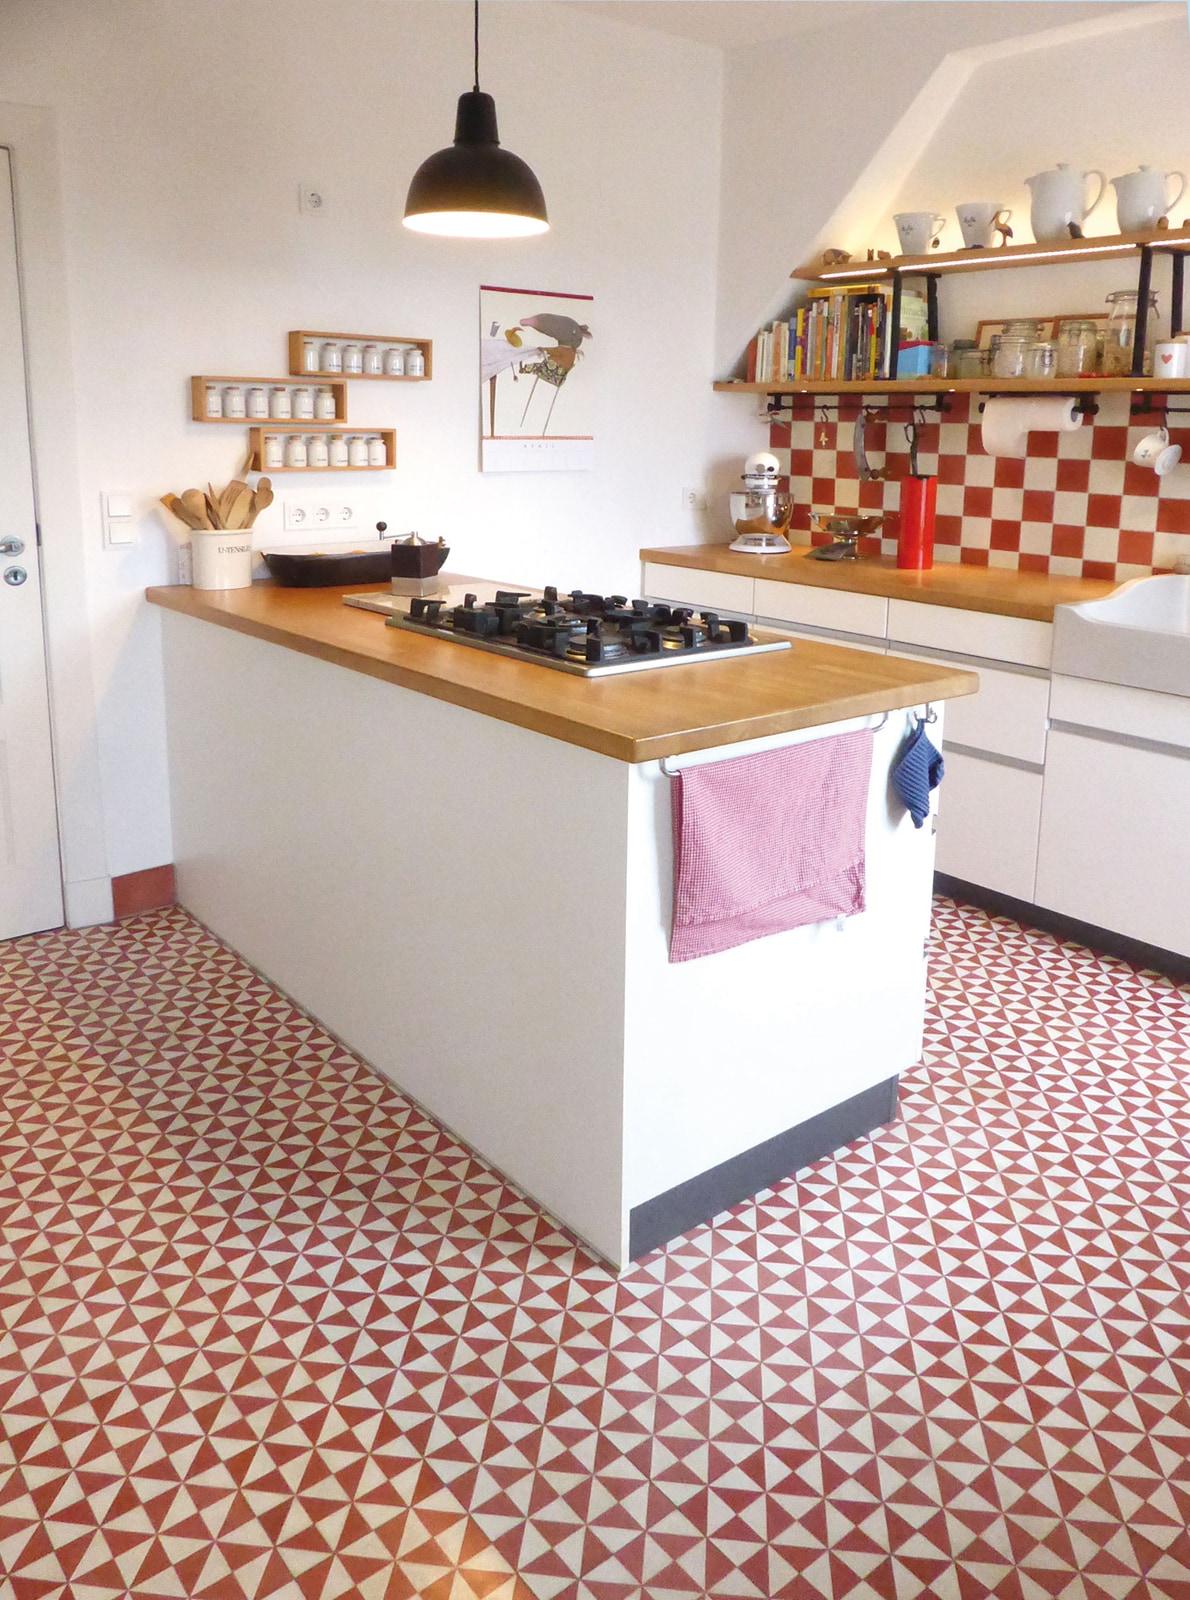 Zementfliesen-küche-10432-Foto Uwe Tittel-via-gmbh | 10432